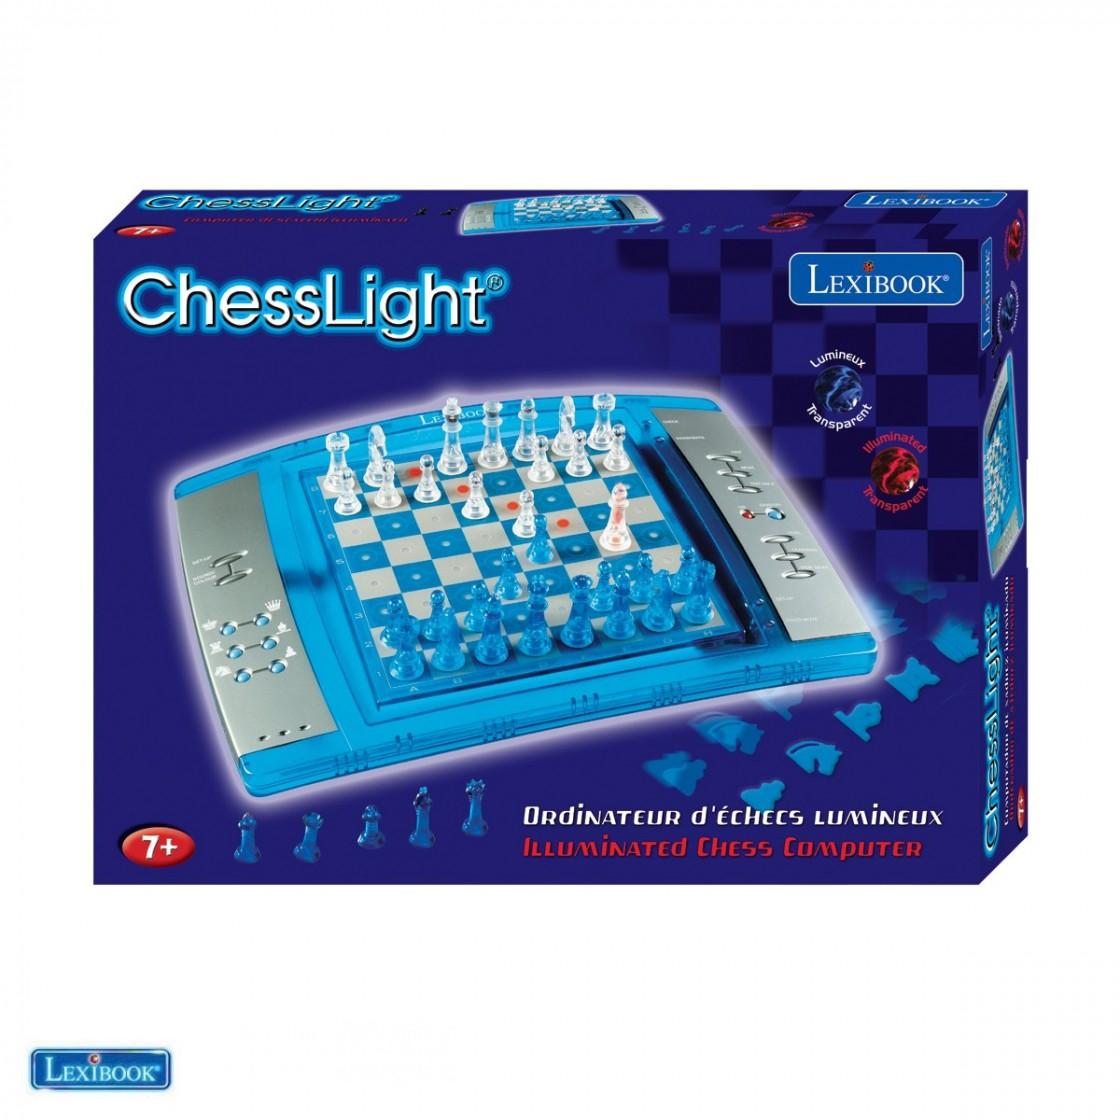 Lexibook LCG3000 Illuminated Electronic Computer Chess Light Game Board